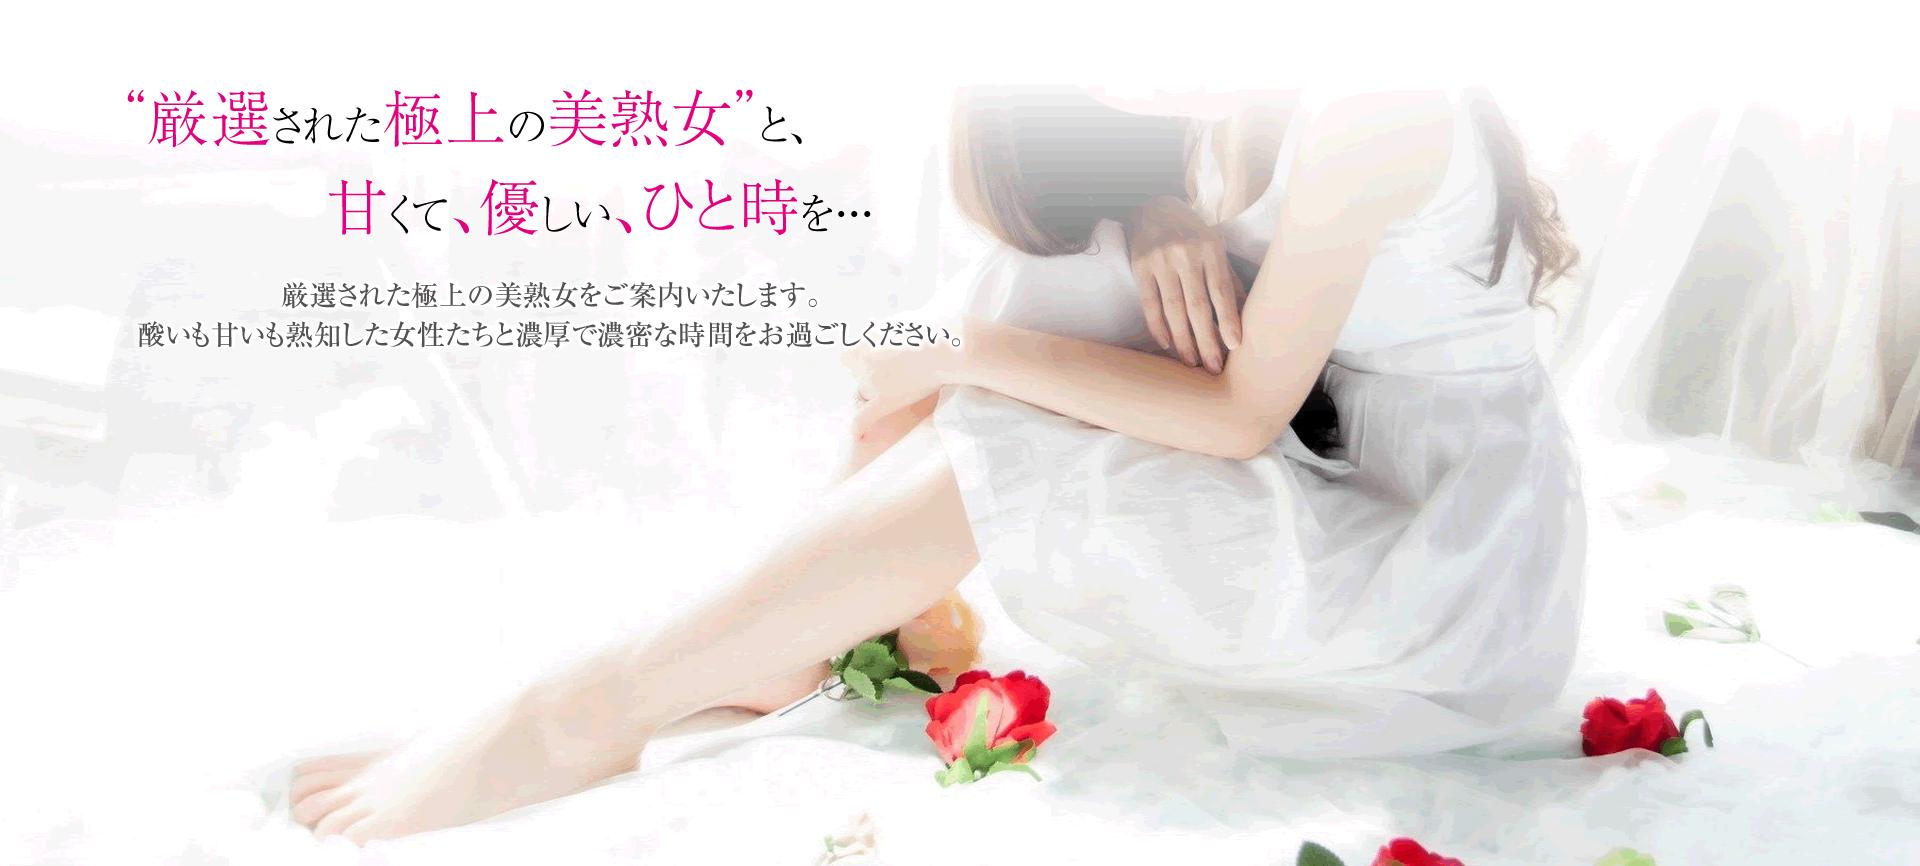 slider image01